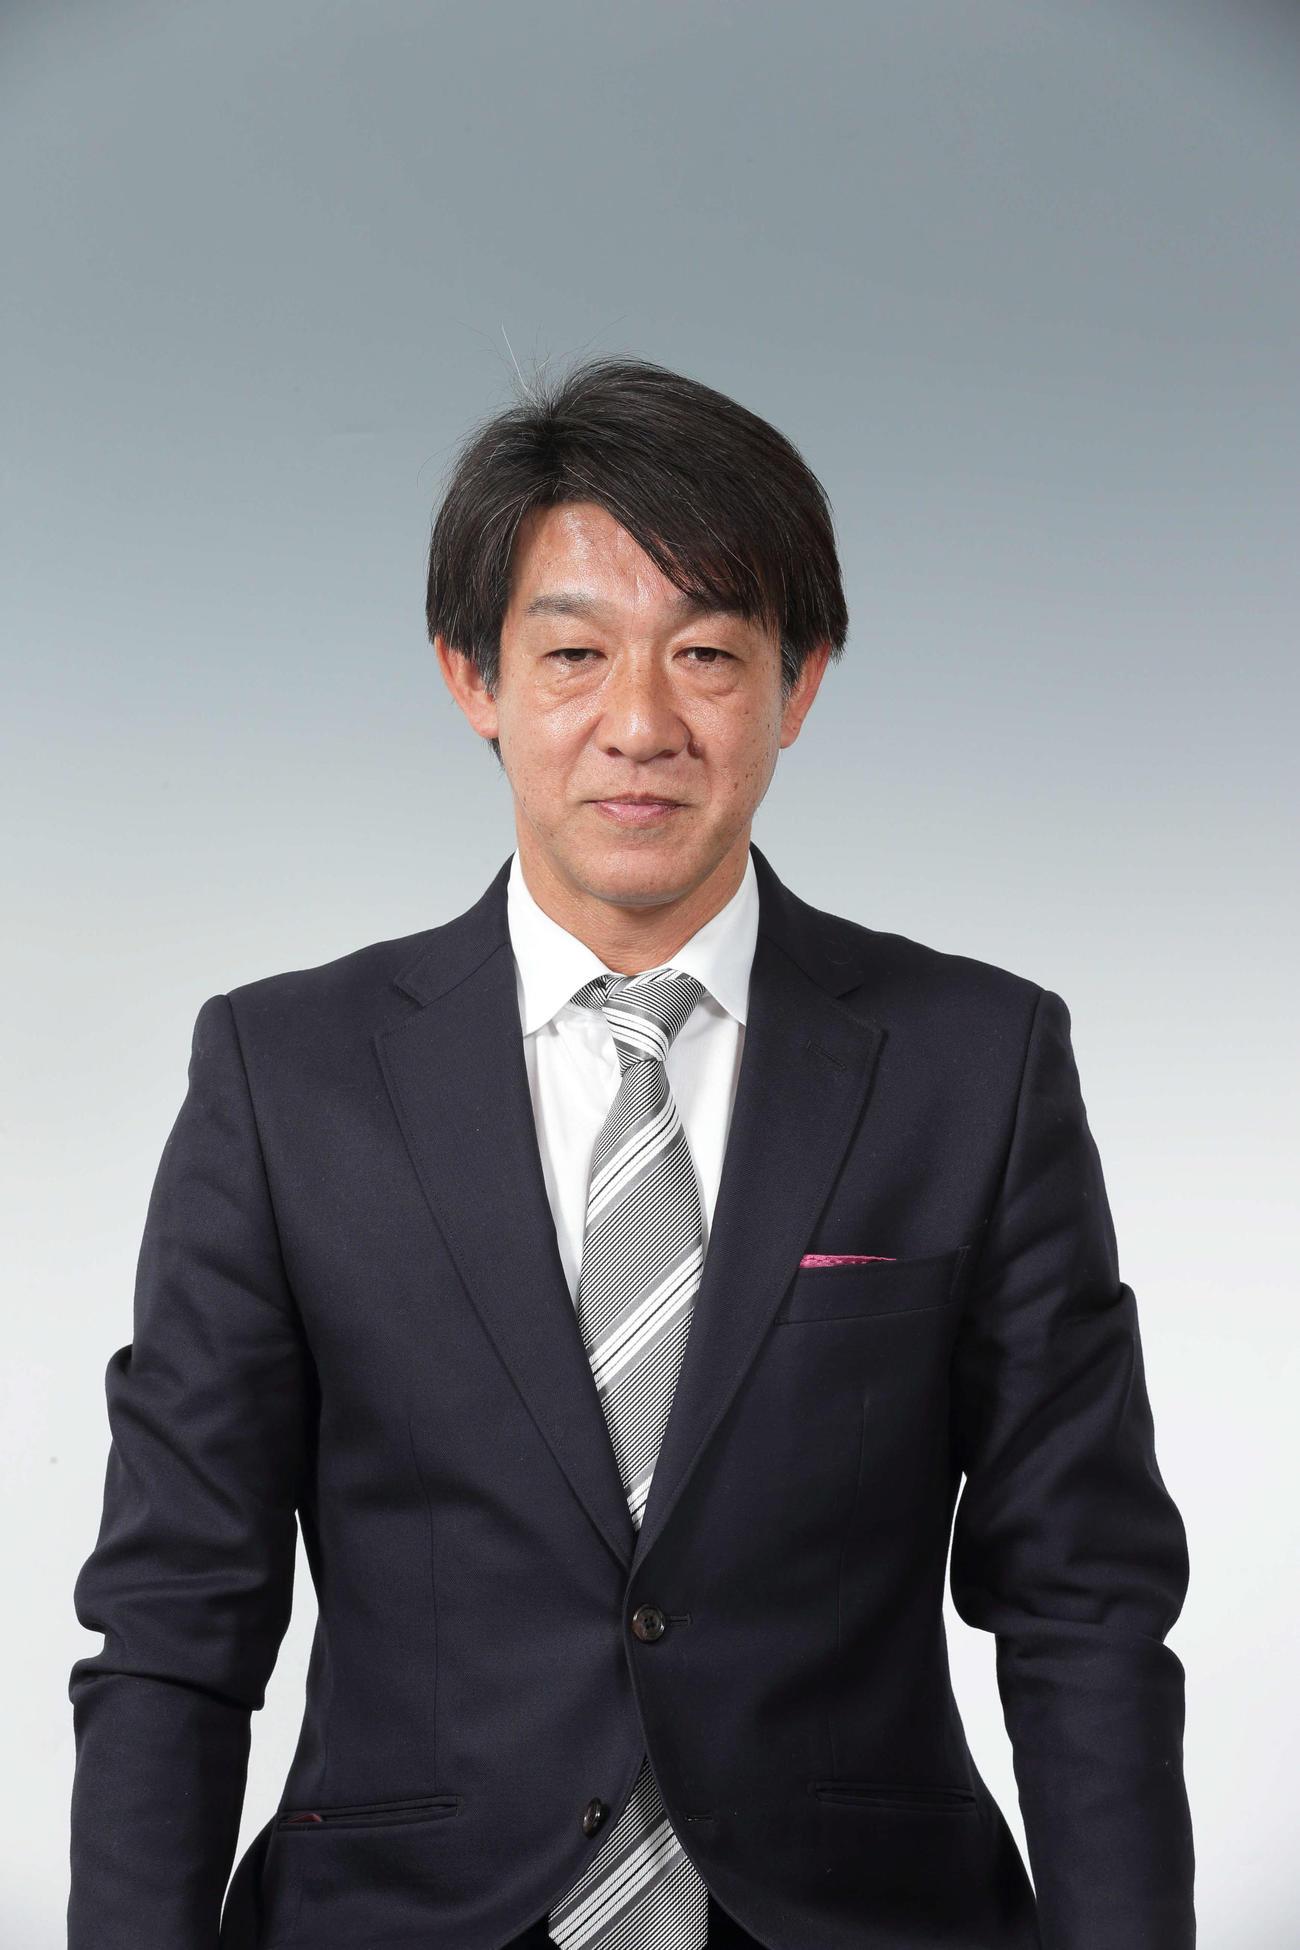 G大阪の取締役に就任した和田昌裕氏(C)GAMBA OSAKA